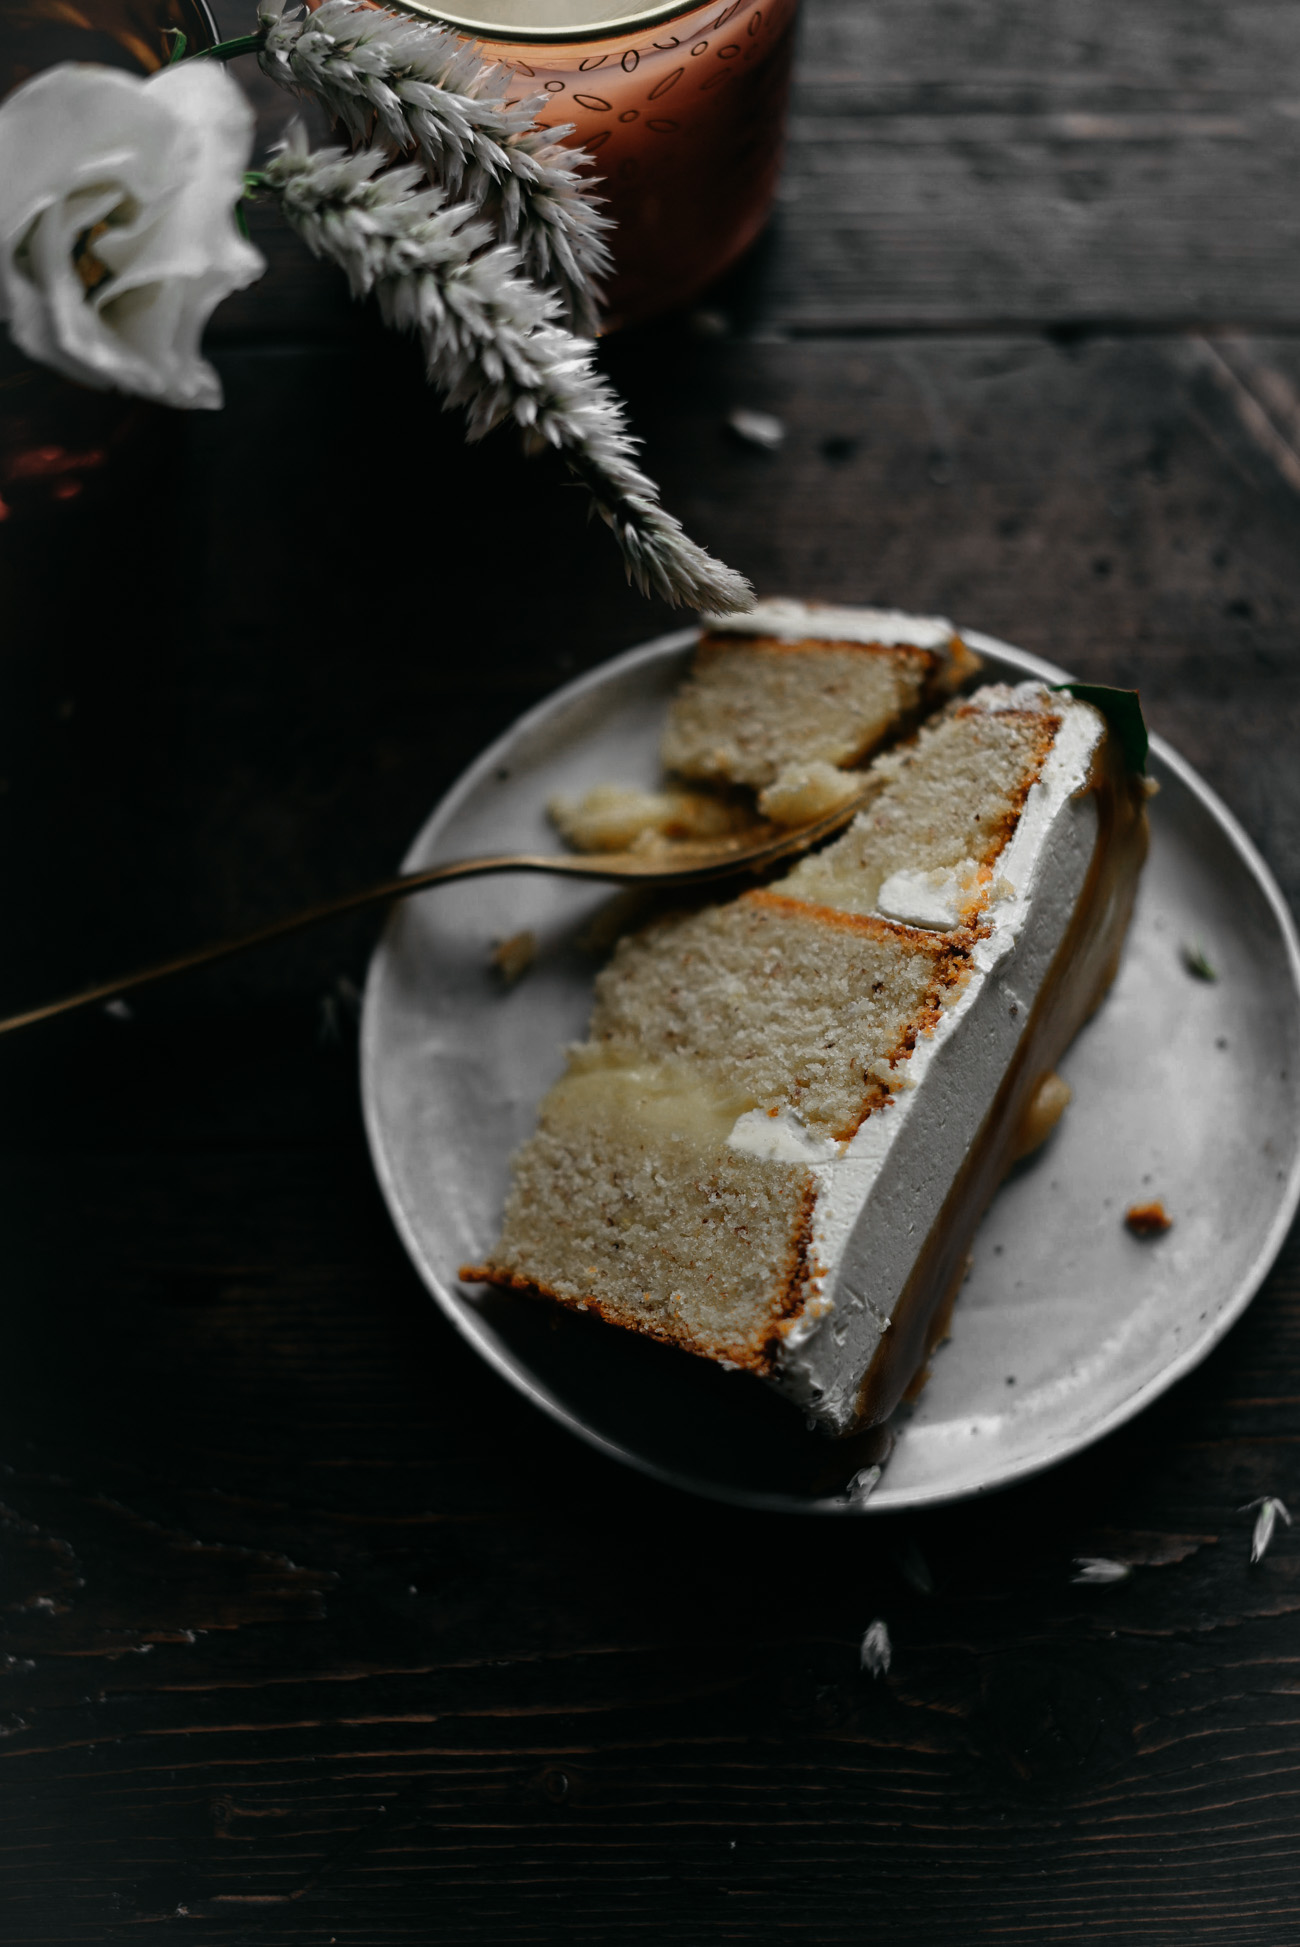 Italian-Orange-Blossom-and-Almond-Cake-with-Orange-Curd-Mascarpone-Swiss-Meringue-Buttercream-and-Fleur-d'Oranger-Caramel-11.jpg